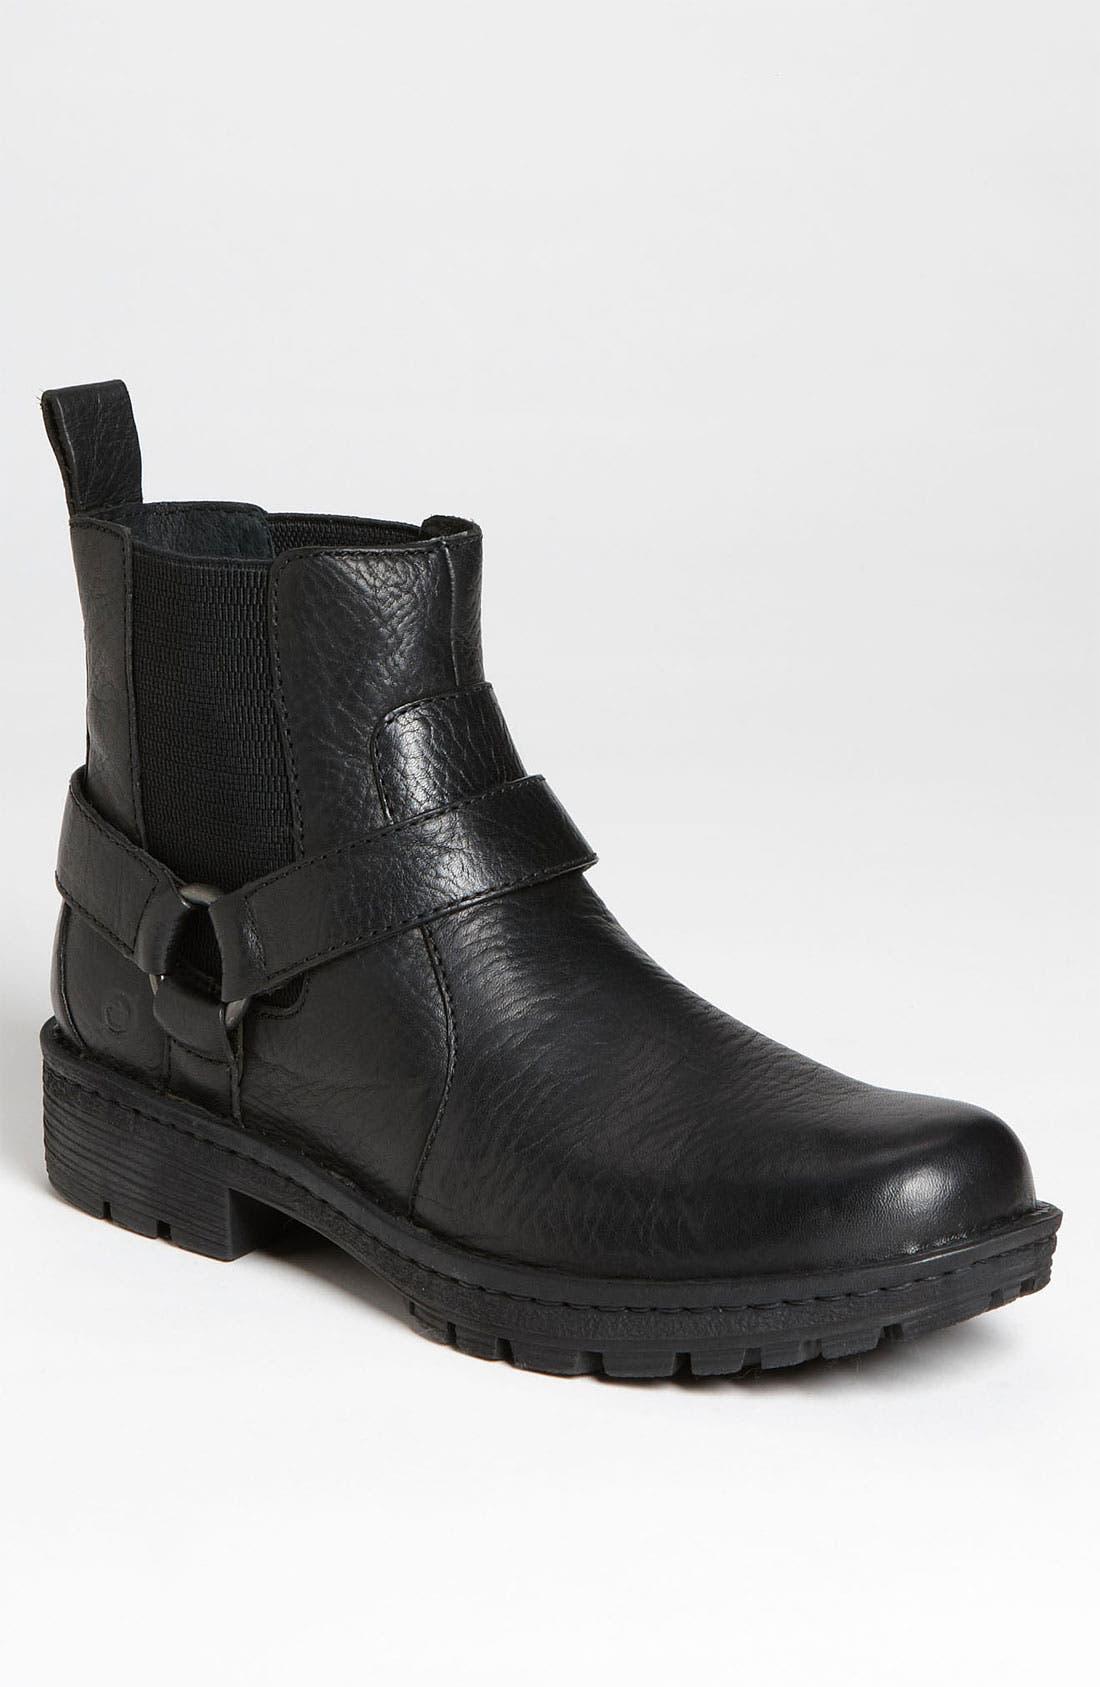 Alternate Image 1 Selected - Børn 'Brunell' Harness Chelsea Boot (Men)